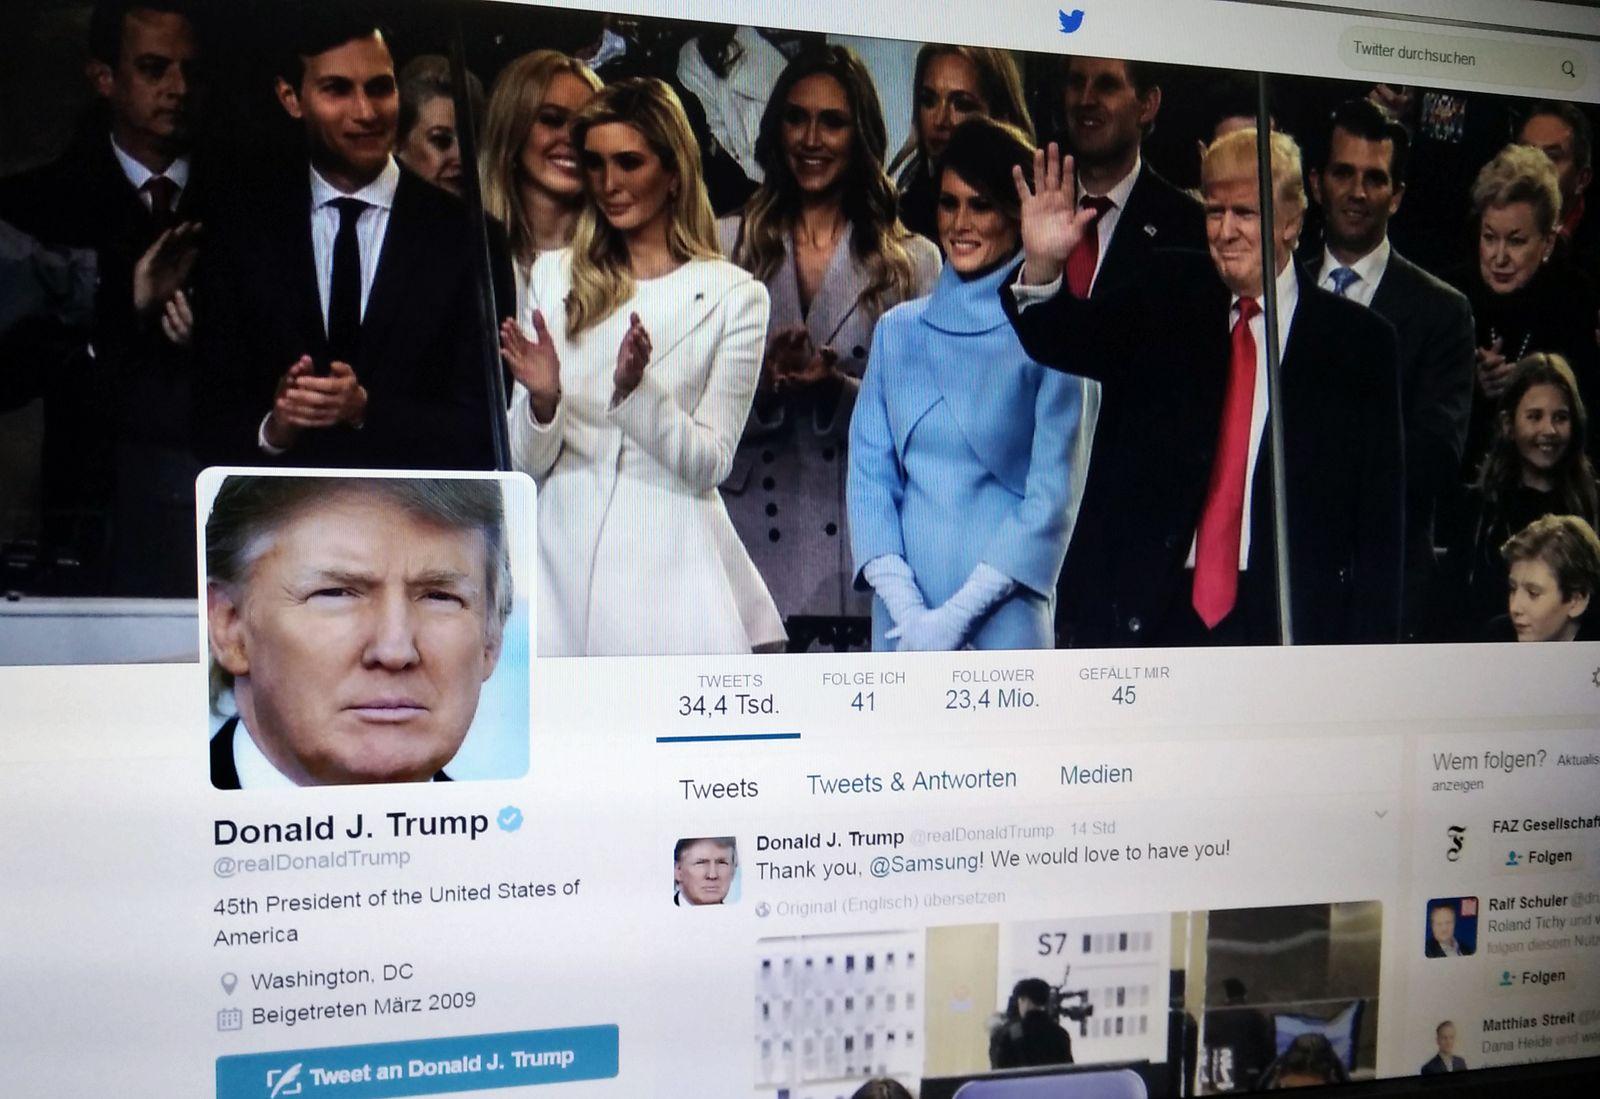 Donald Trump / Twitter